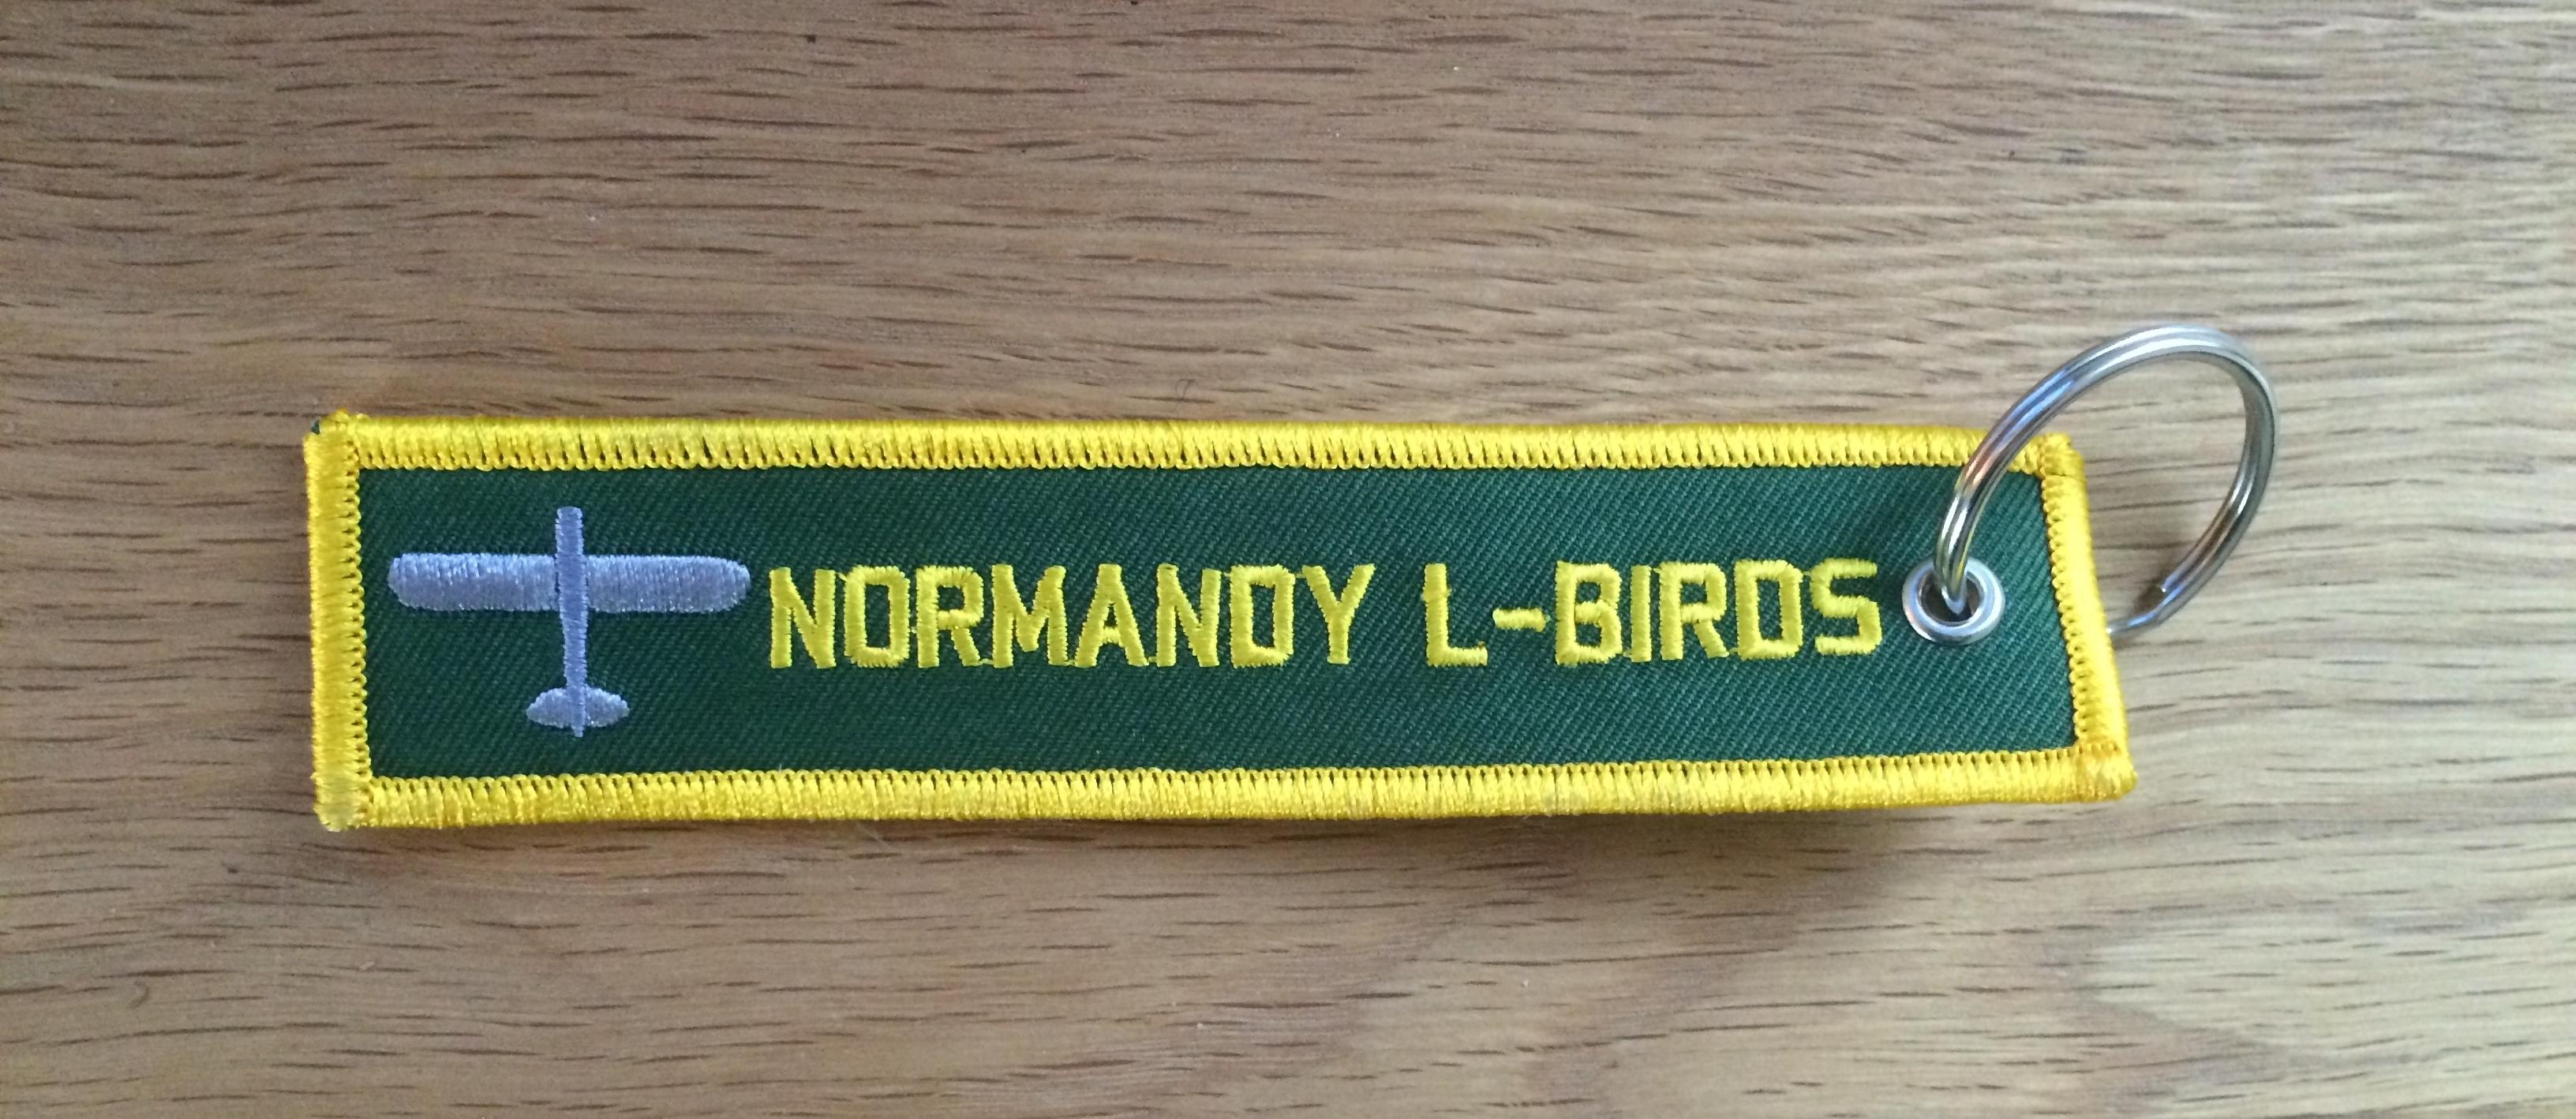 Porte-clef / keyring L-Birds D-Day